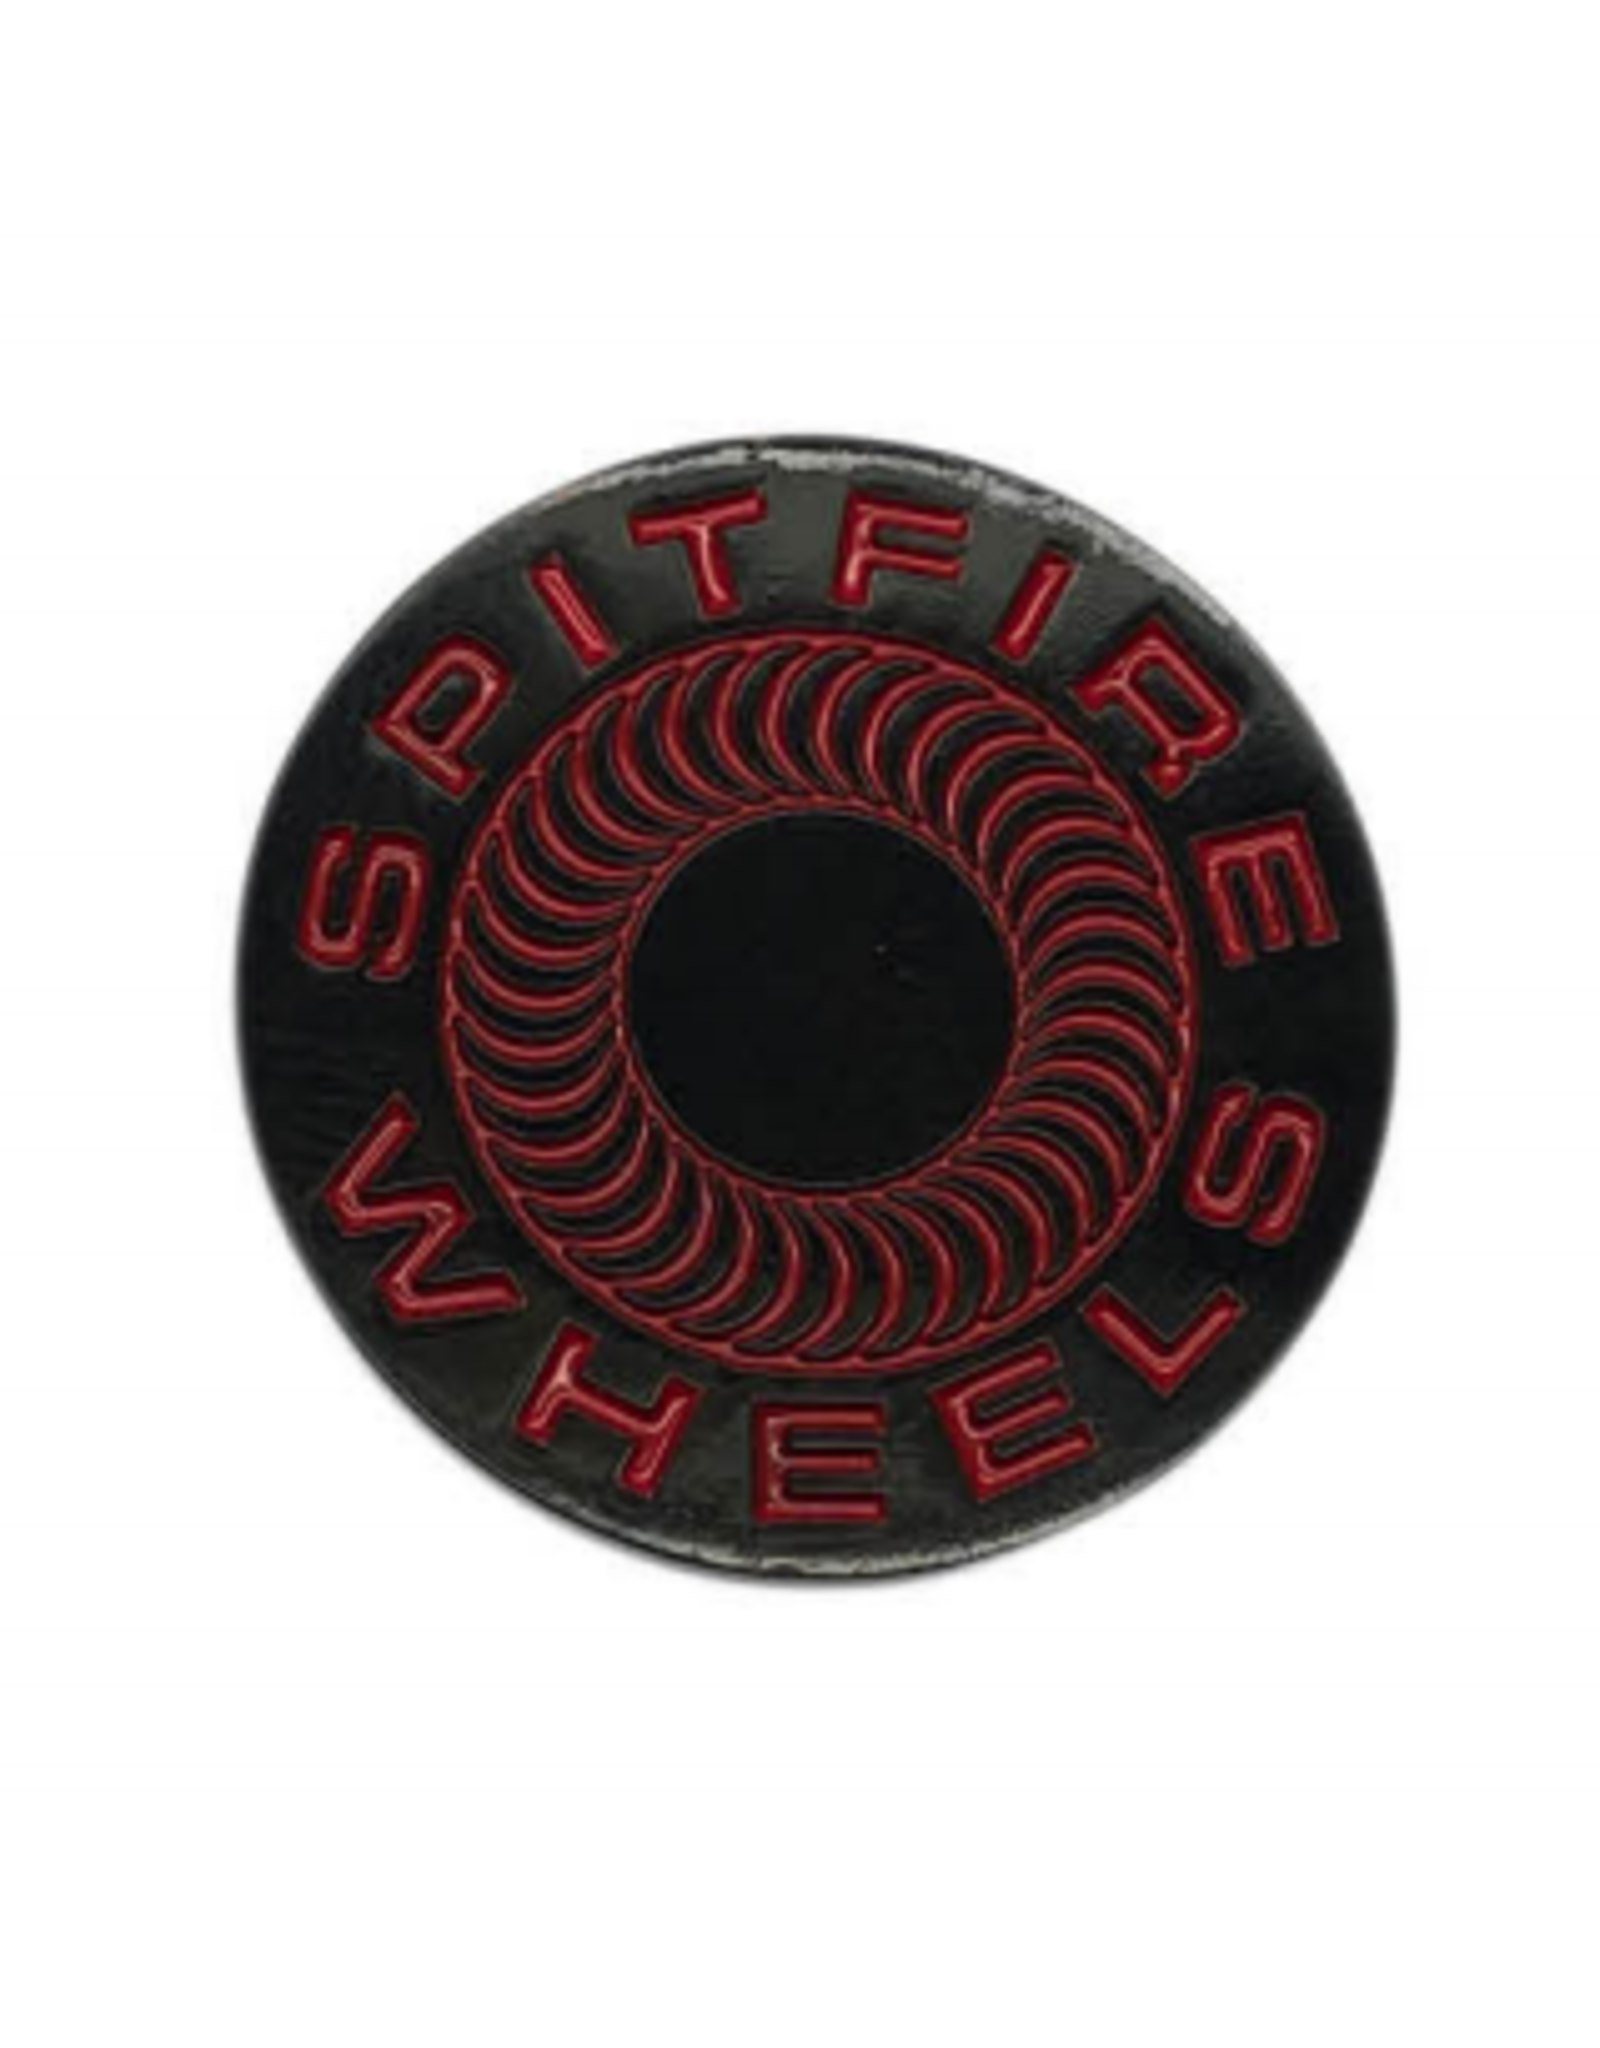 Spitfire Classic '87 Swirl Pin - Black